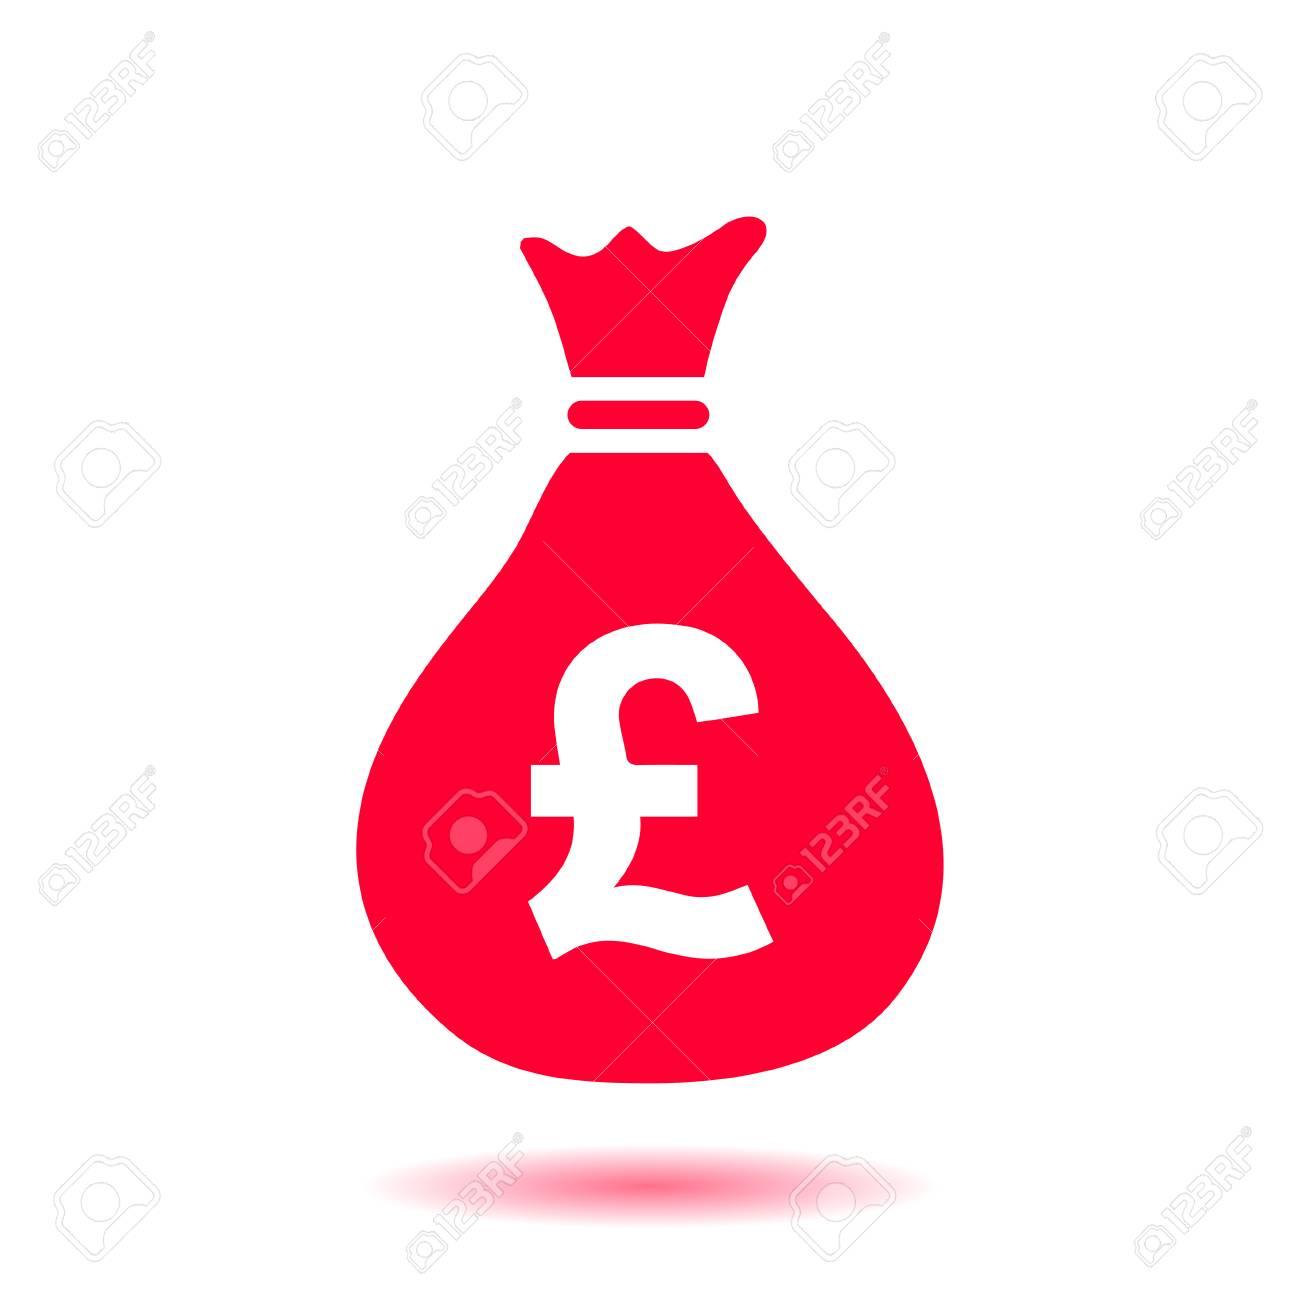 Pound gbp currency symbol flat design style royalty free cliparts pound gbp currency symbol flat design style stock vector 79549289 buycottarizona Choice Image